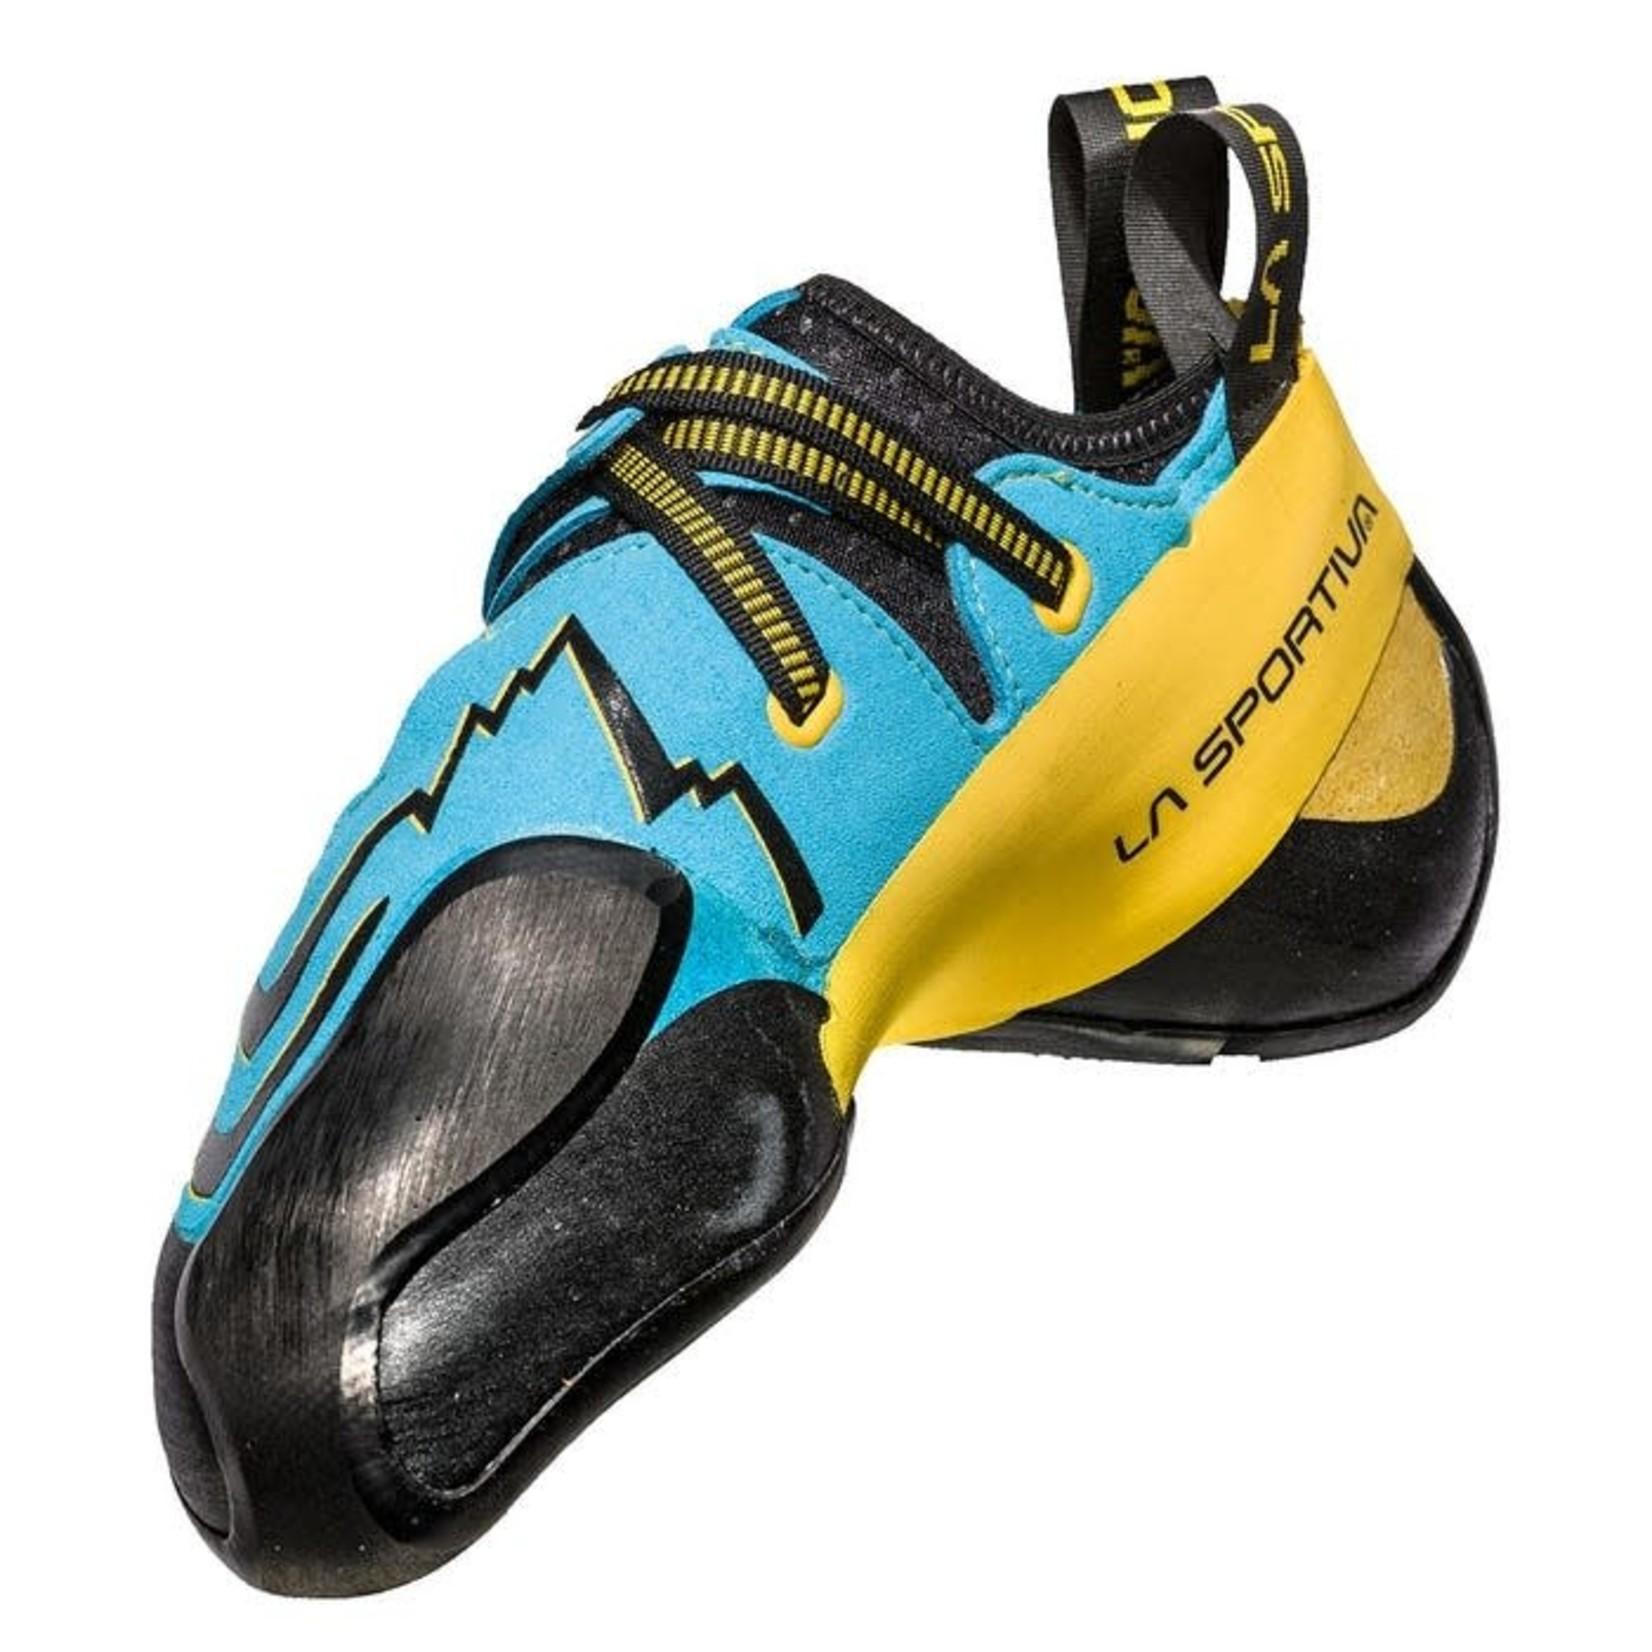 La Sportiva La Sportiva Futura Climbing Shoe - Men